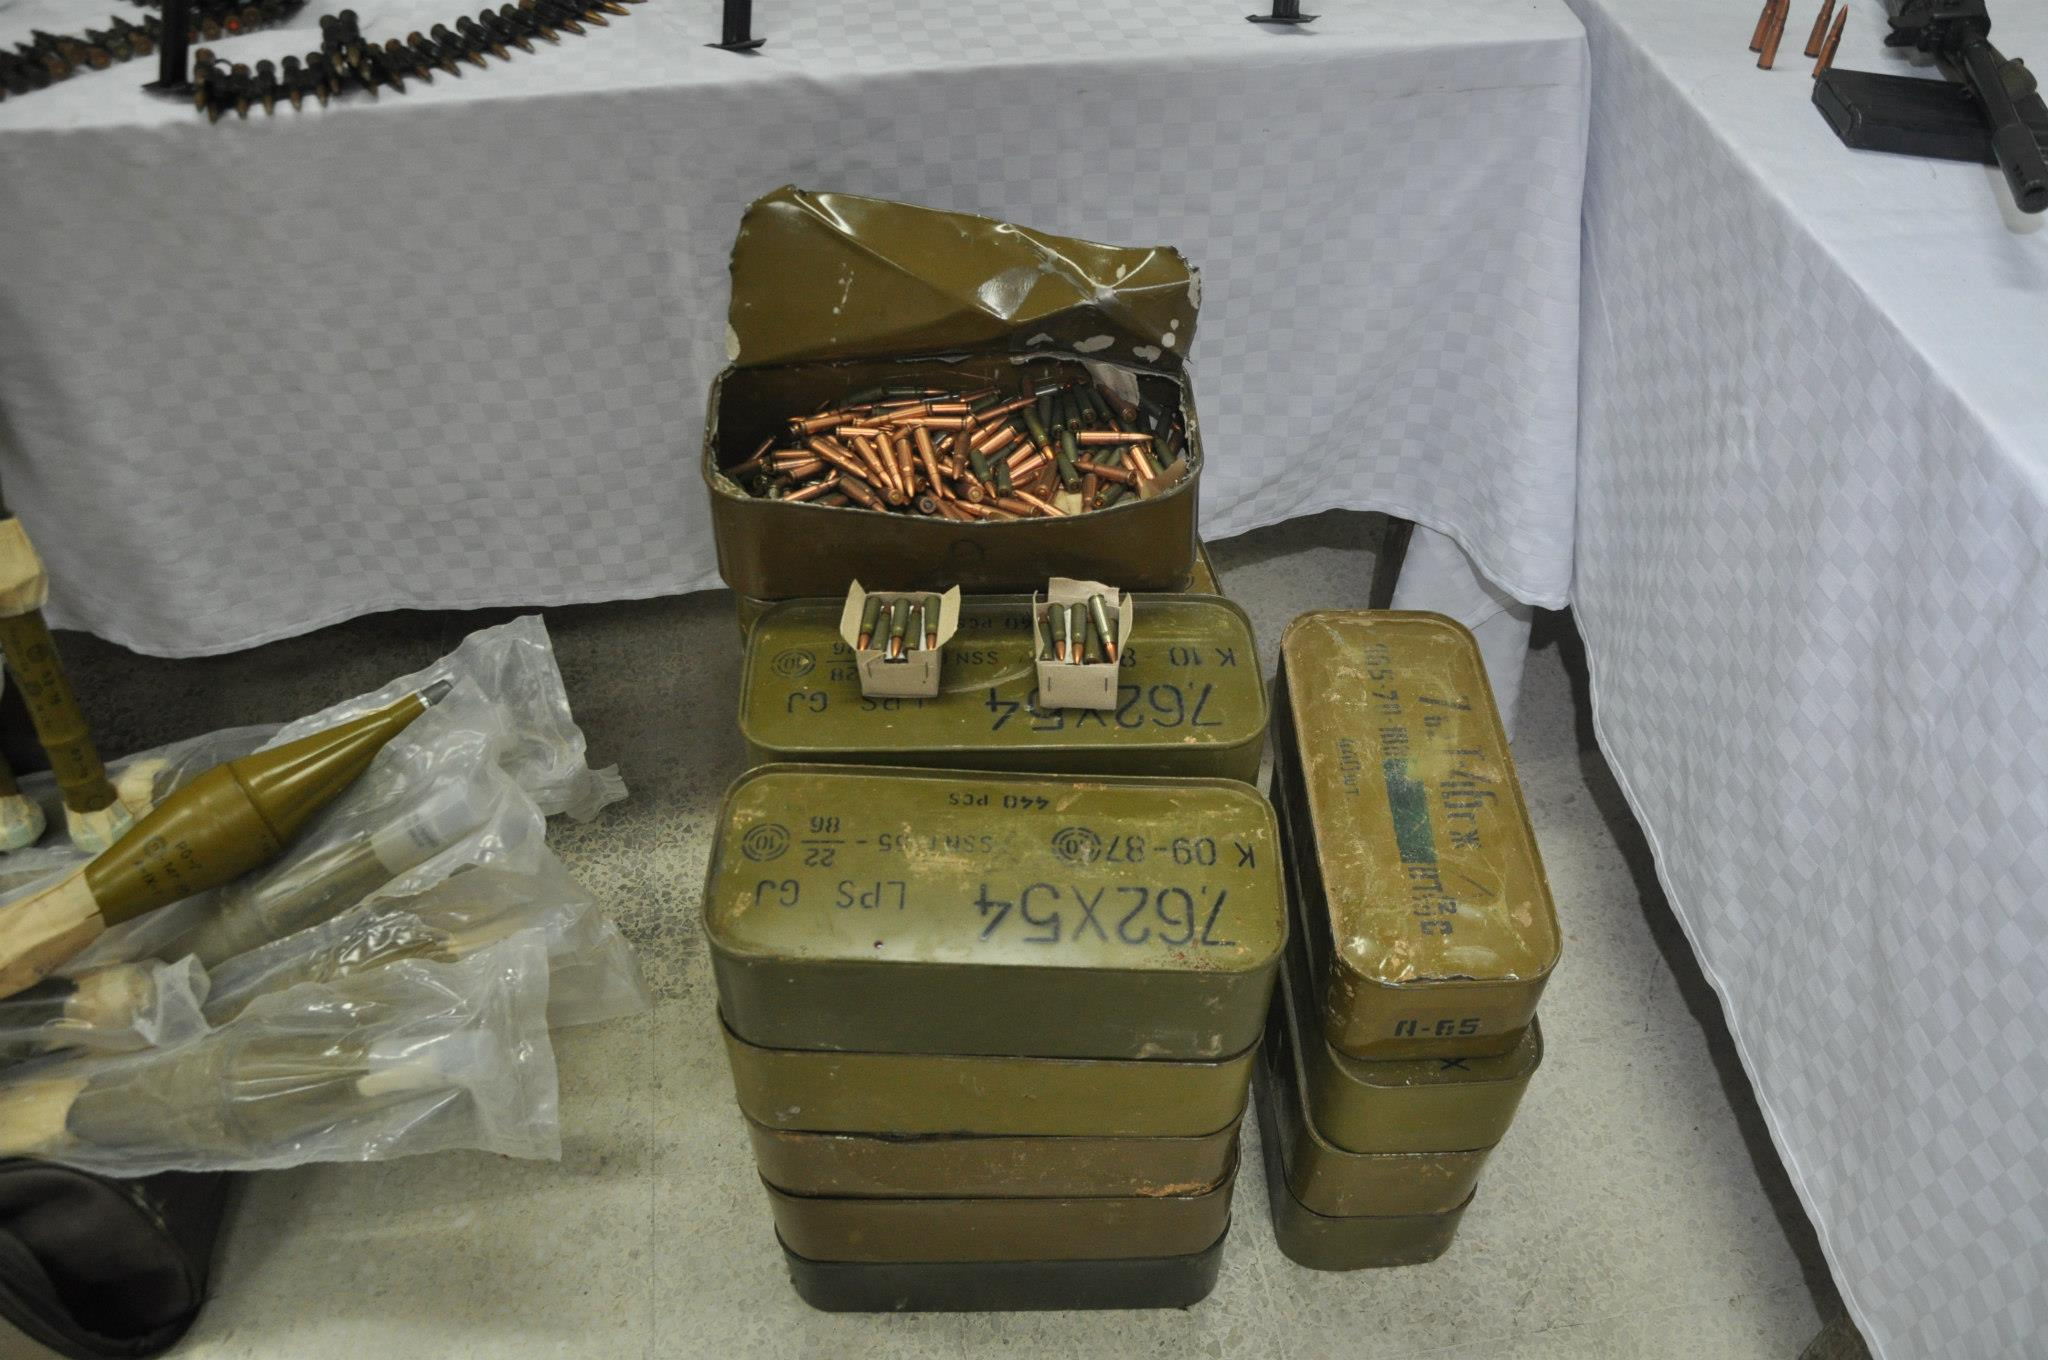 Ammo from Libya captured by Tunisian authorities